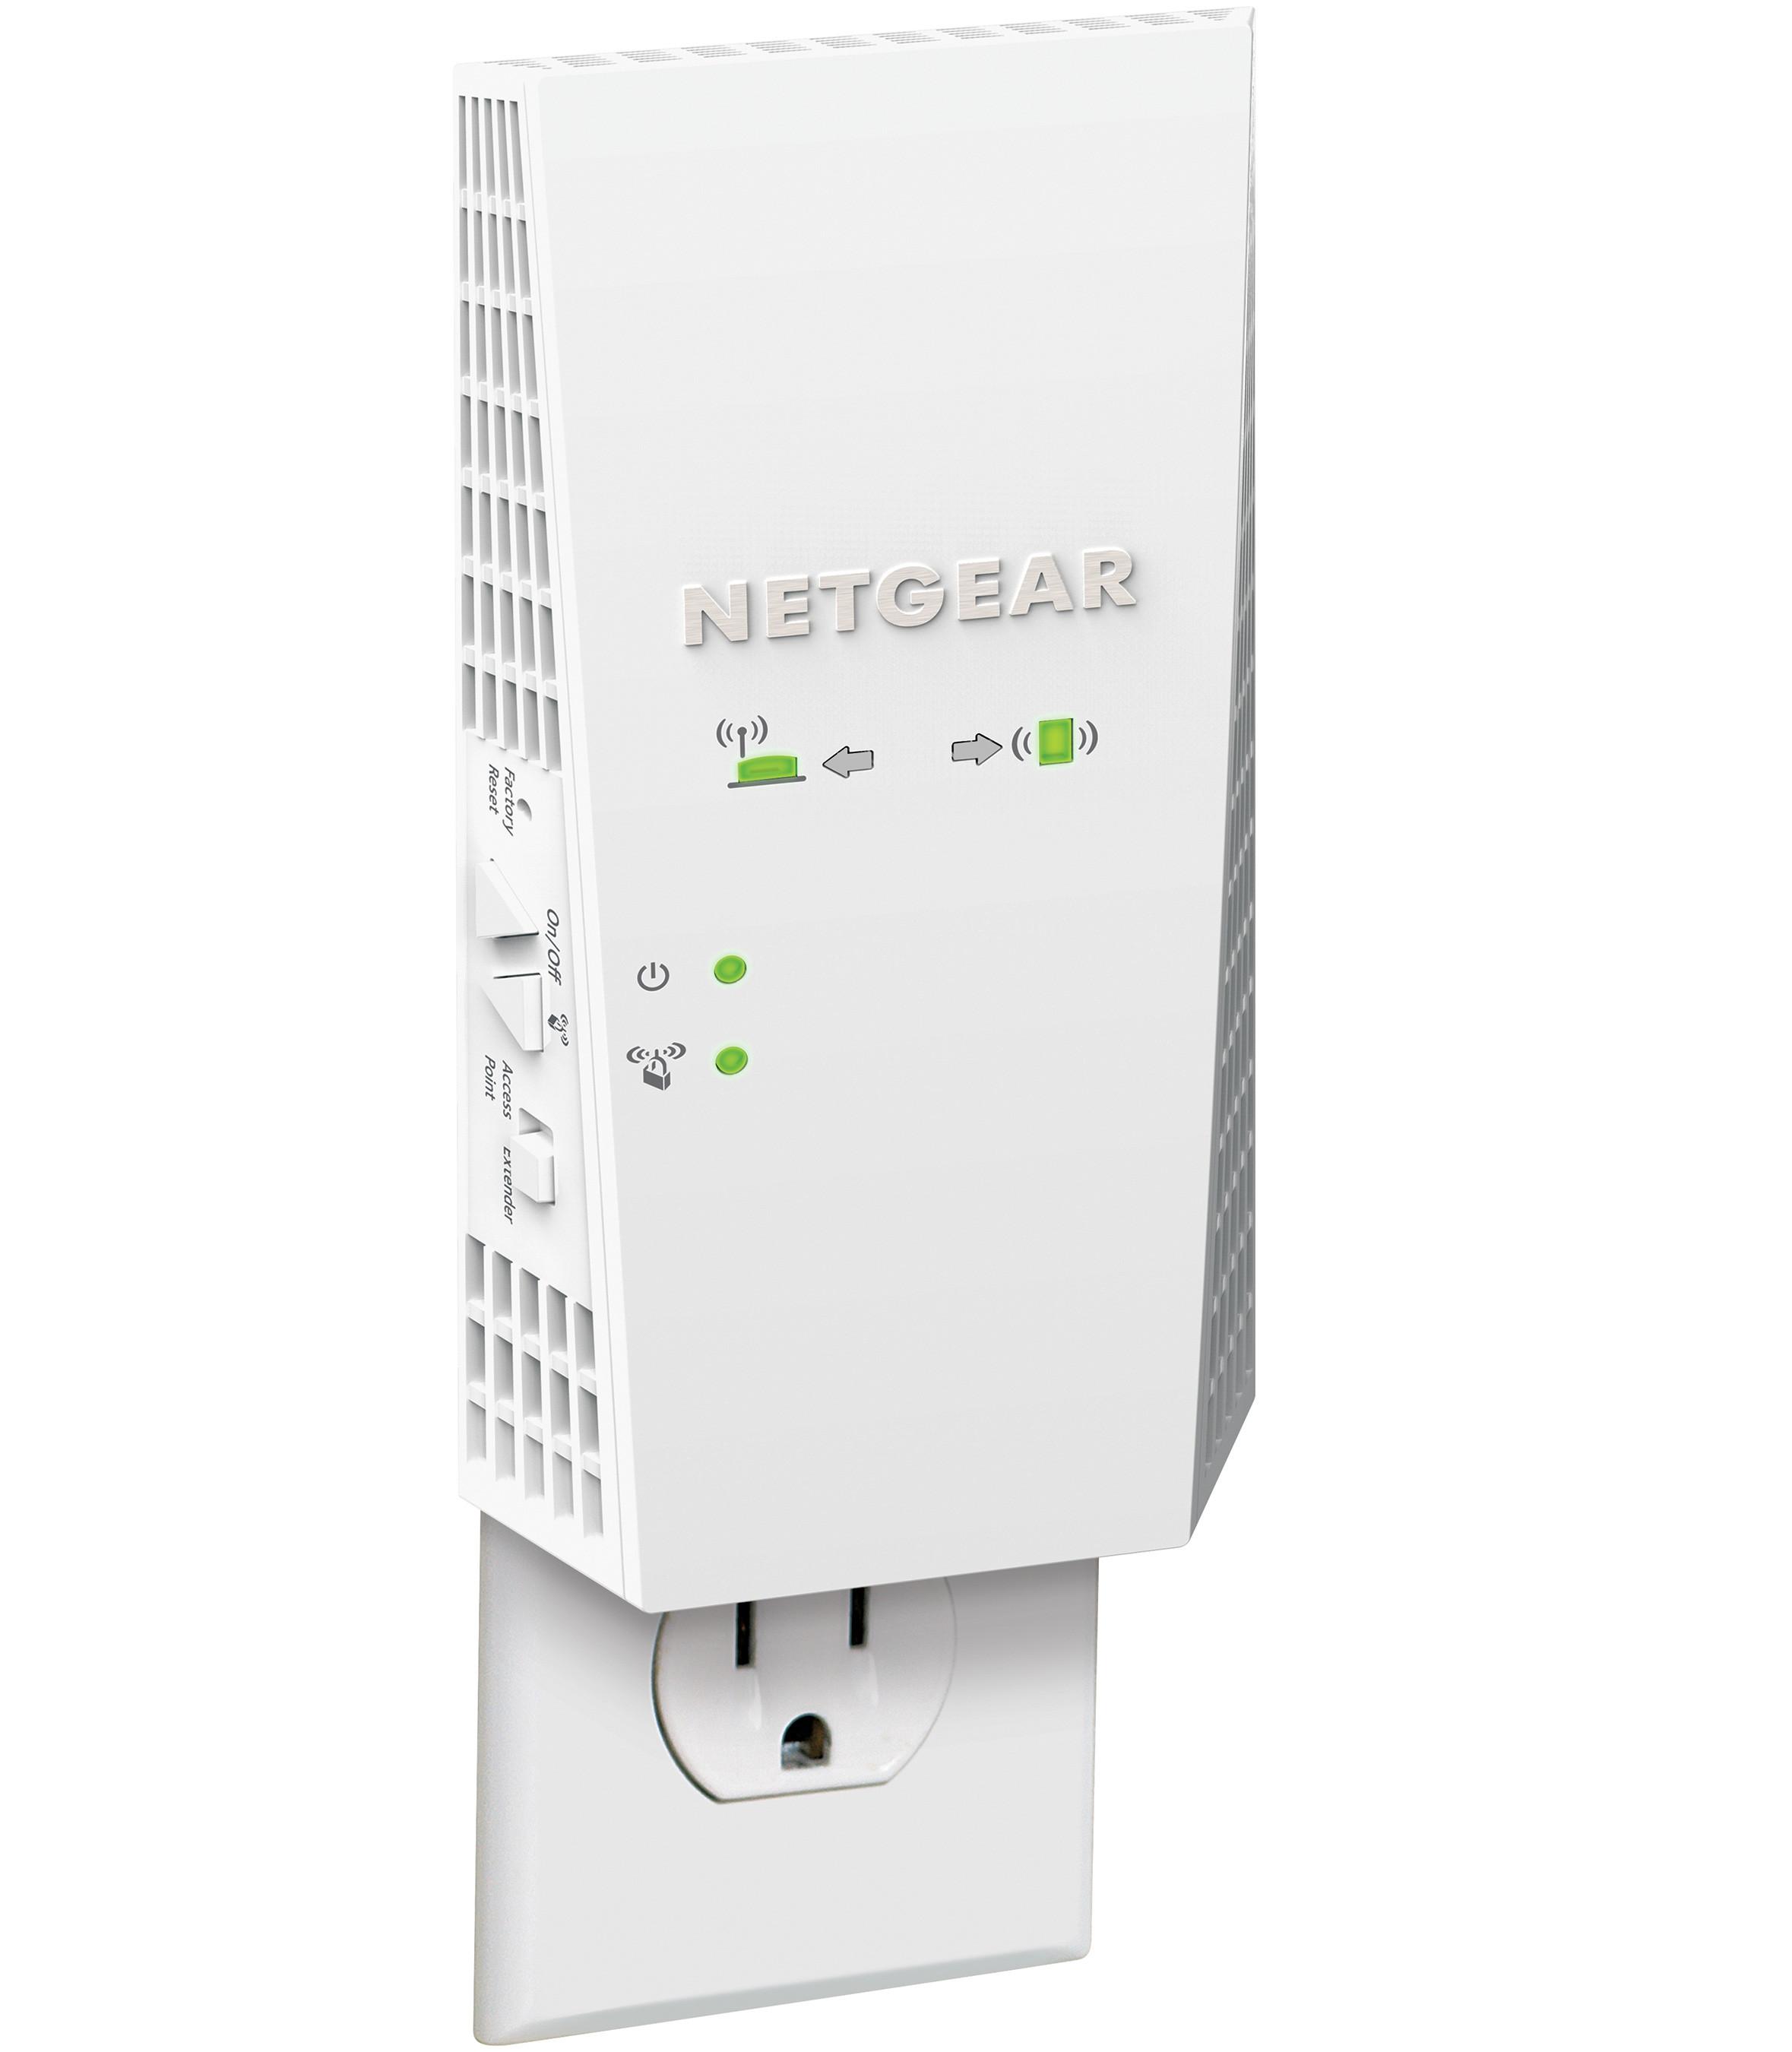 NETGEAR Announces Wall-Plug WiFi Range Extender with 2 2